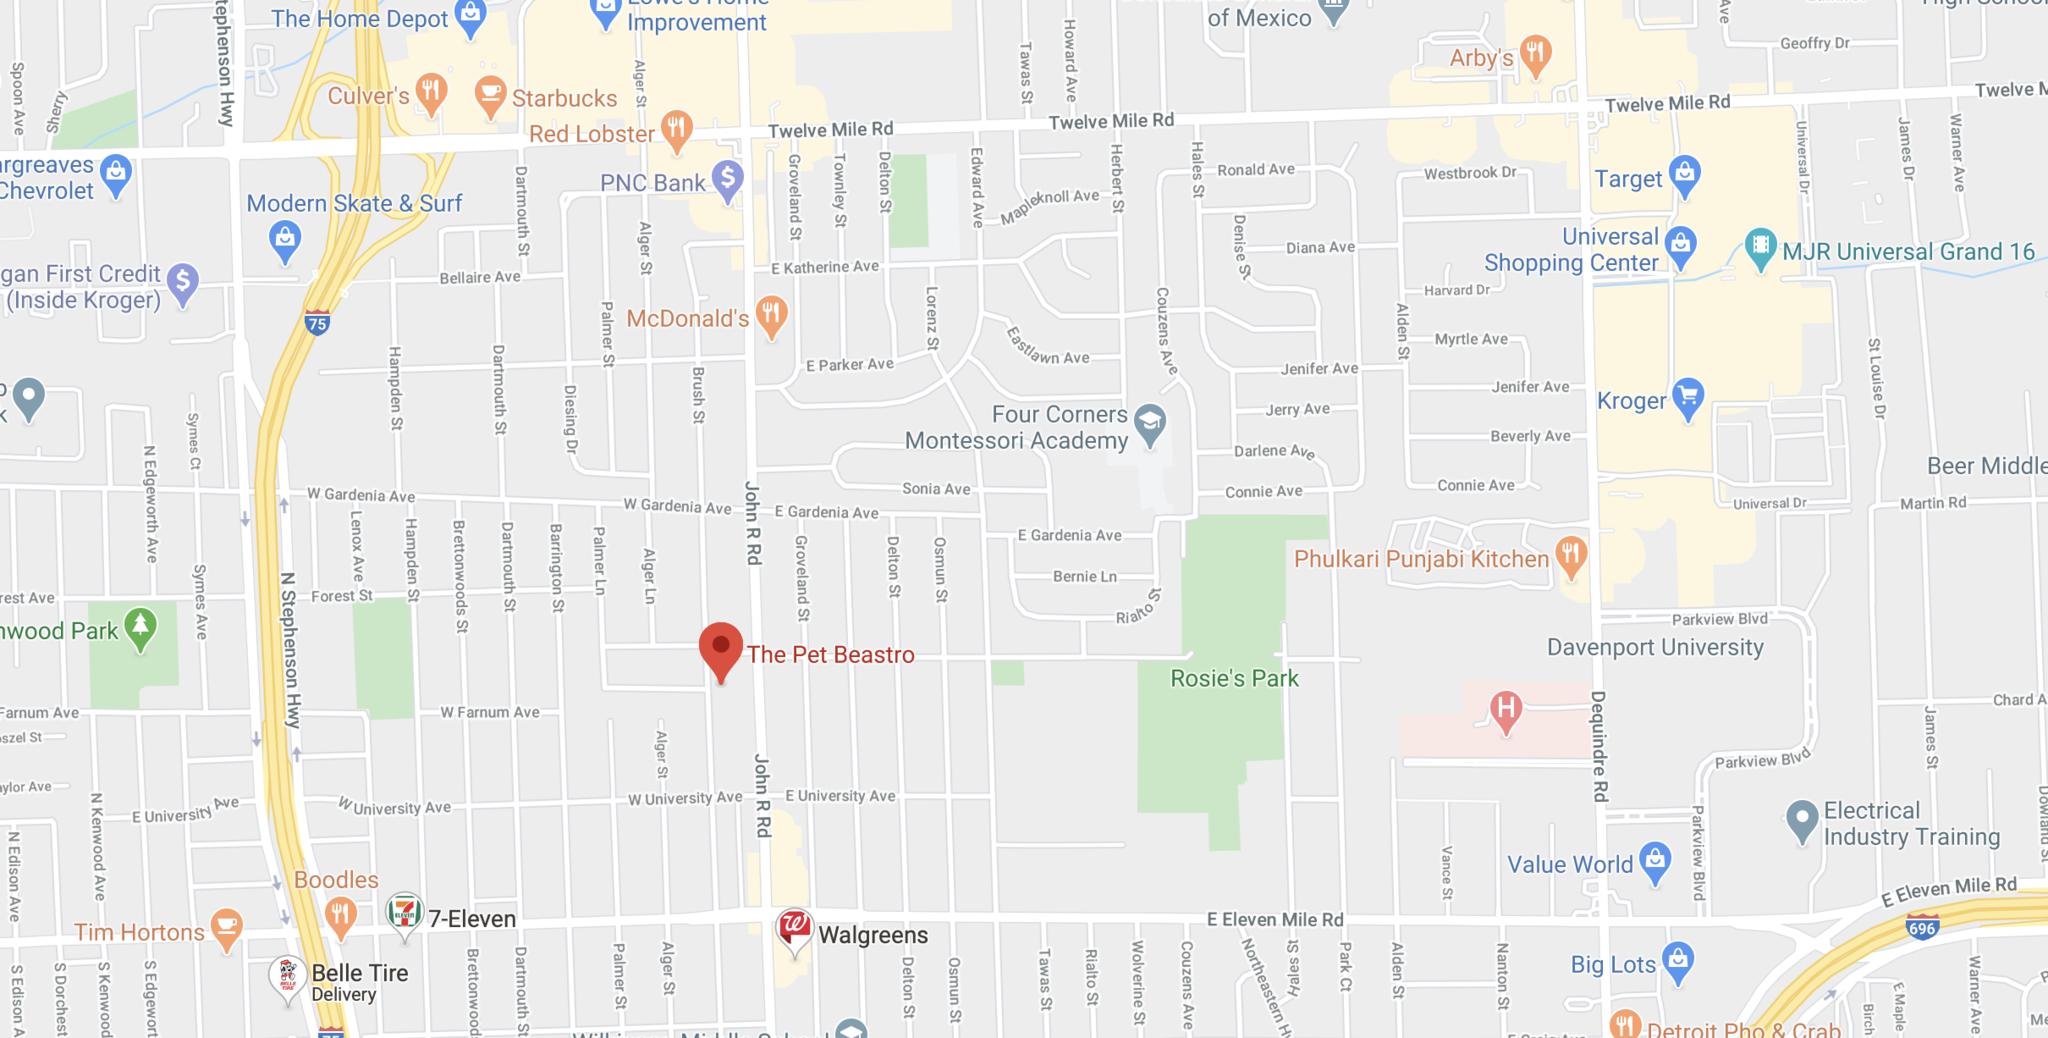 google map The Pet Beastro Location Madison Heights, Michigan